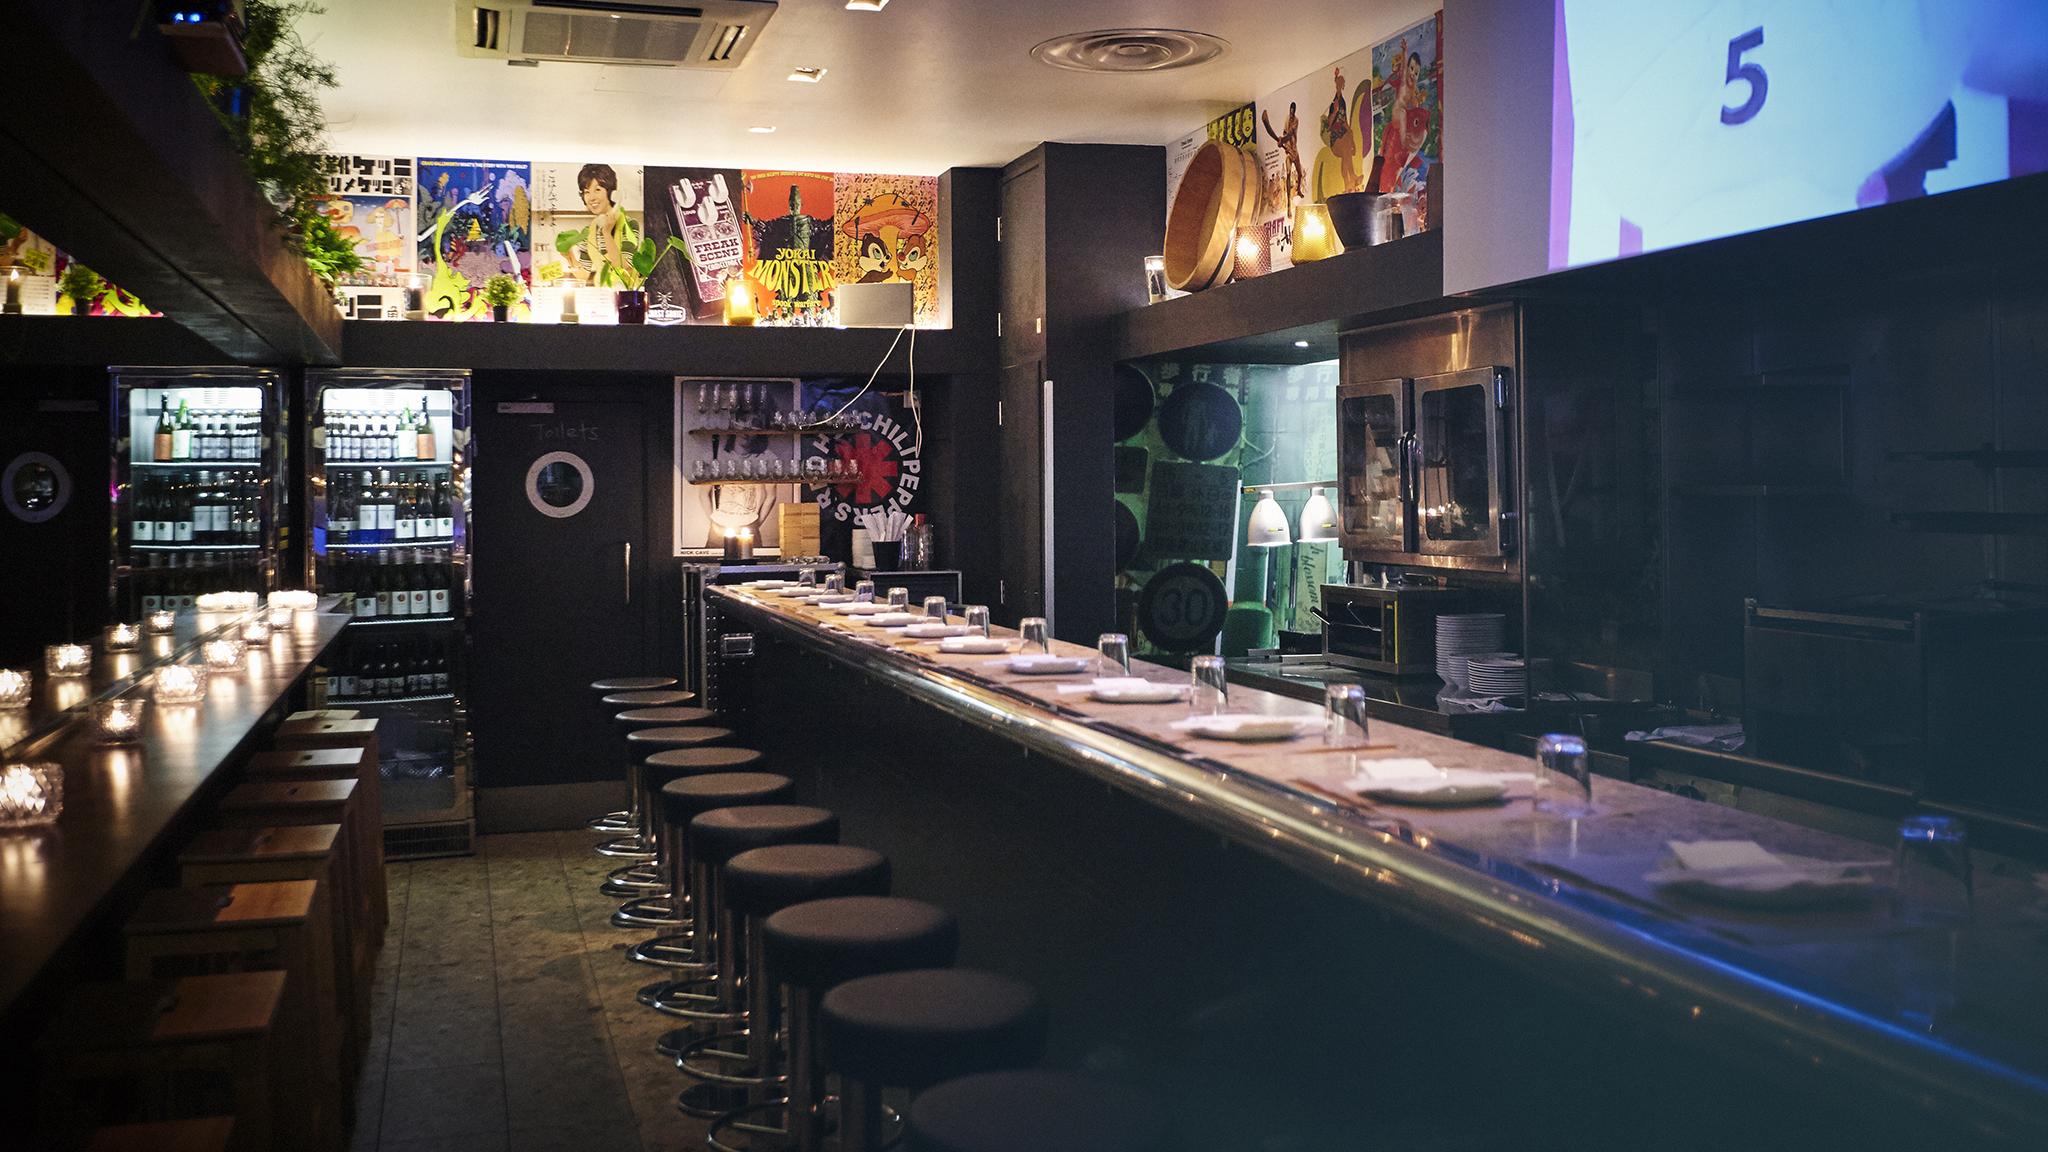 Superb Tim Hayward On Freak Scene Restaurant In London Financial Bralicious Painted Fabric Chair Ideas Braliciousco